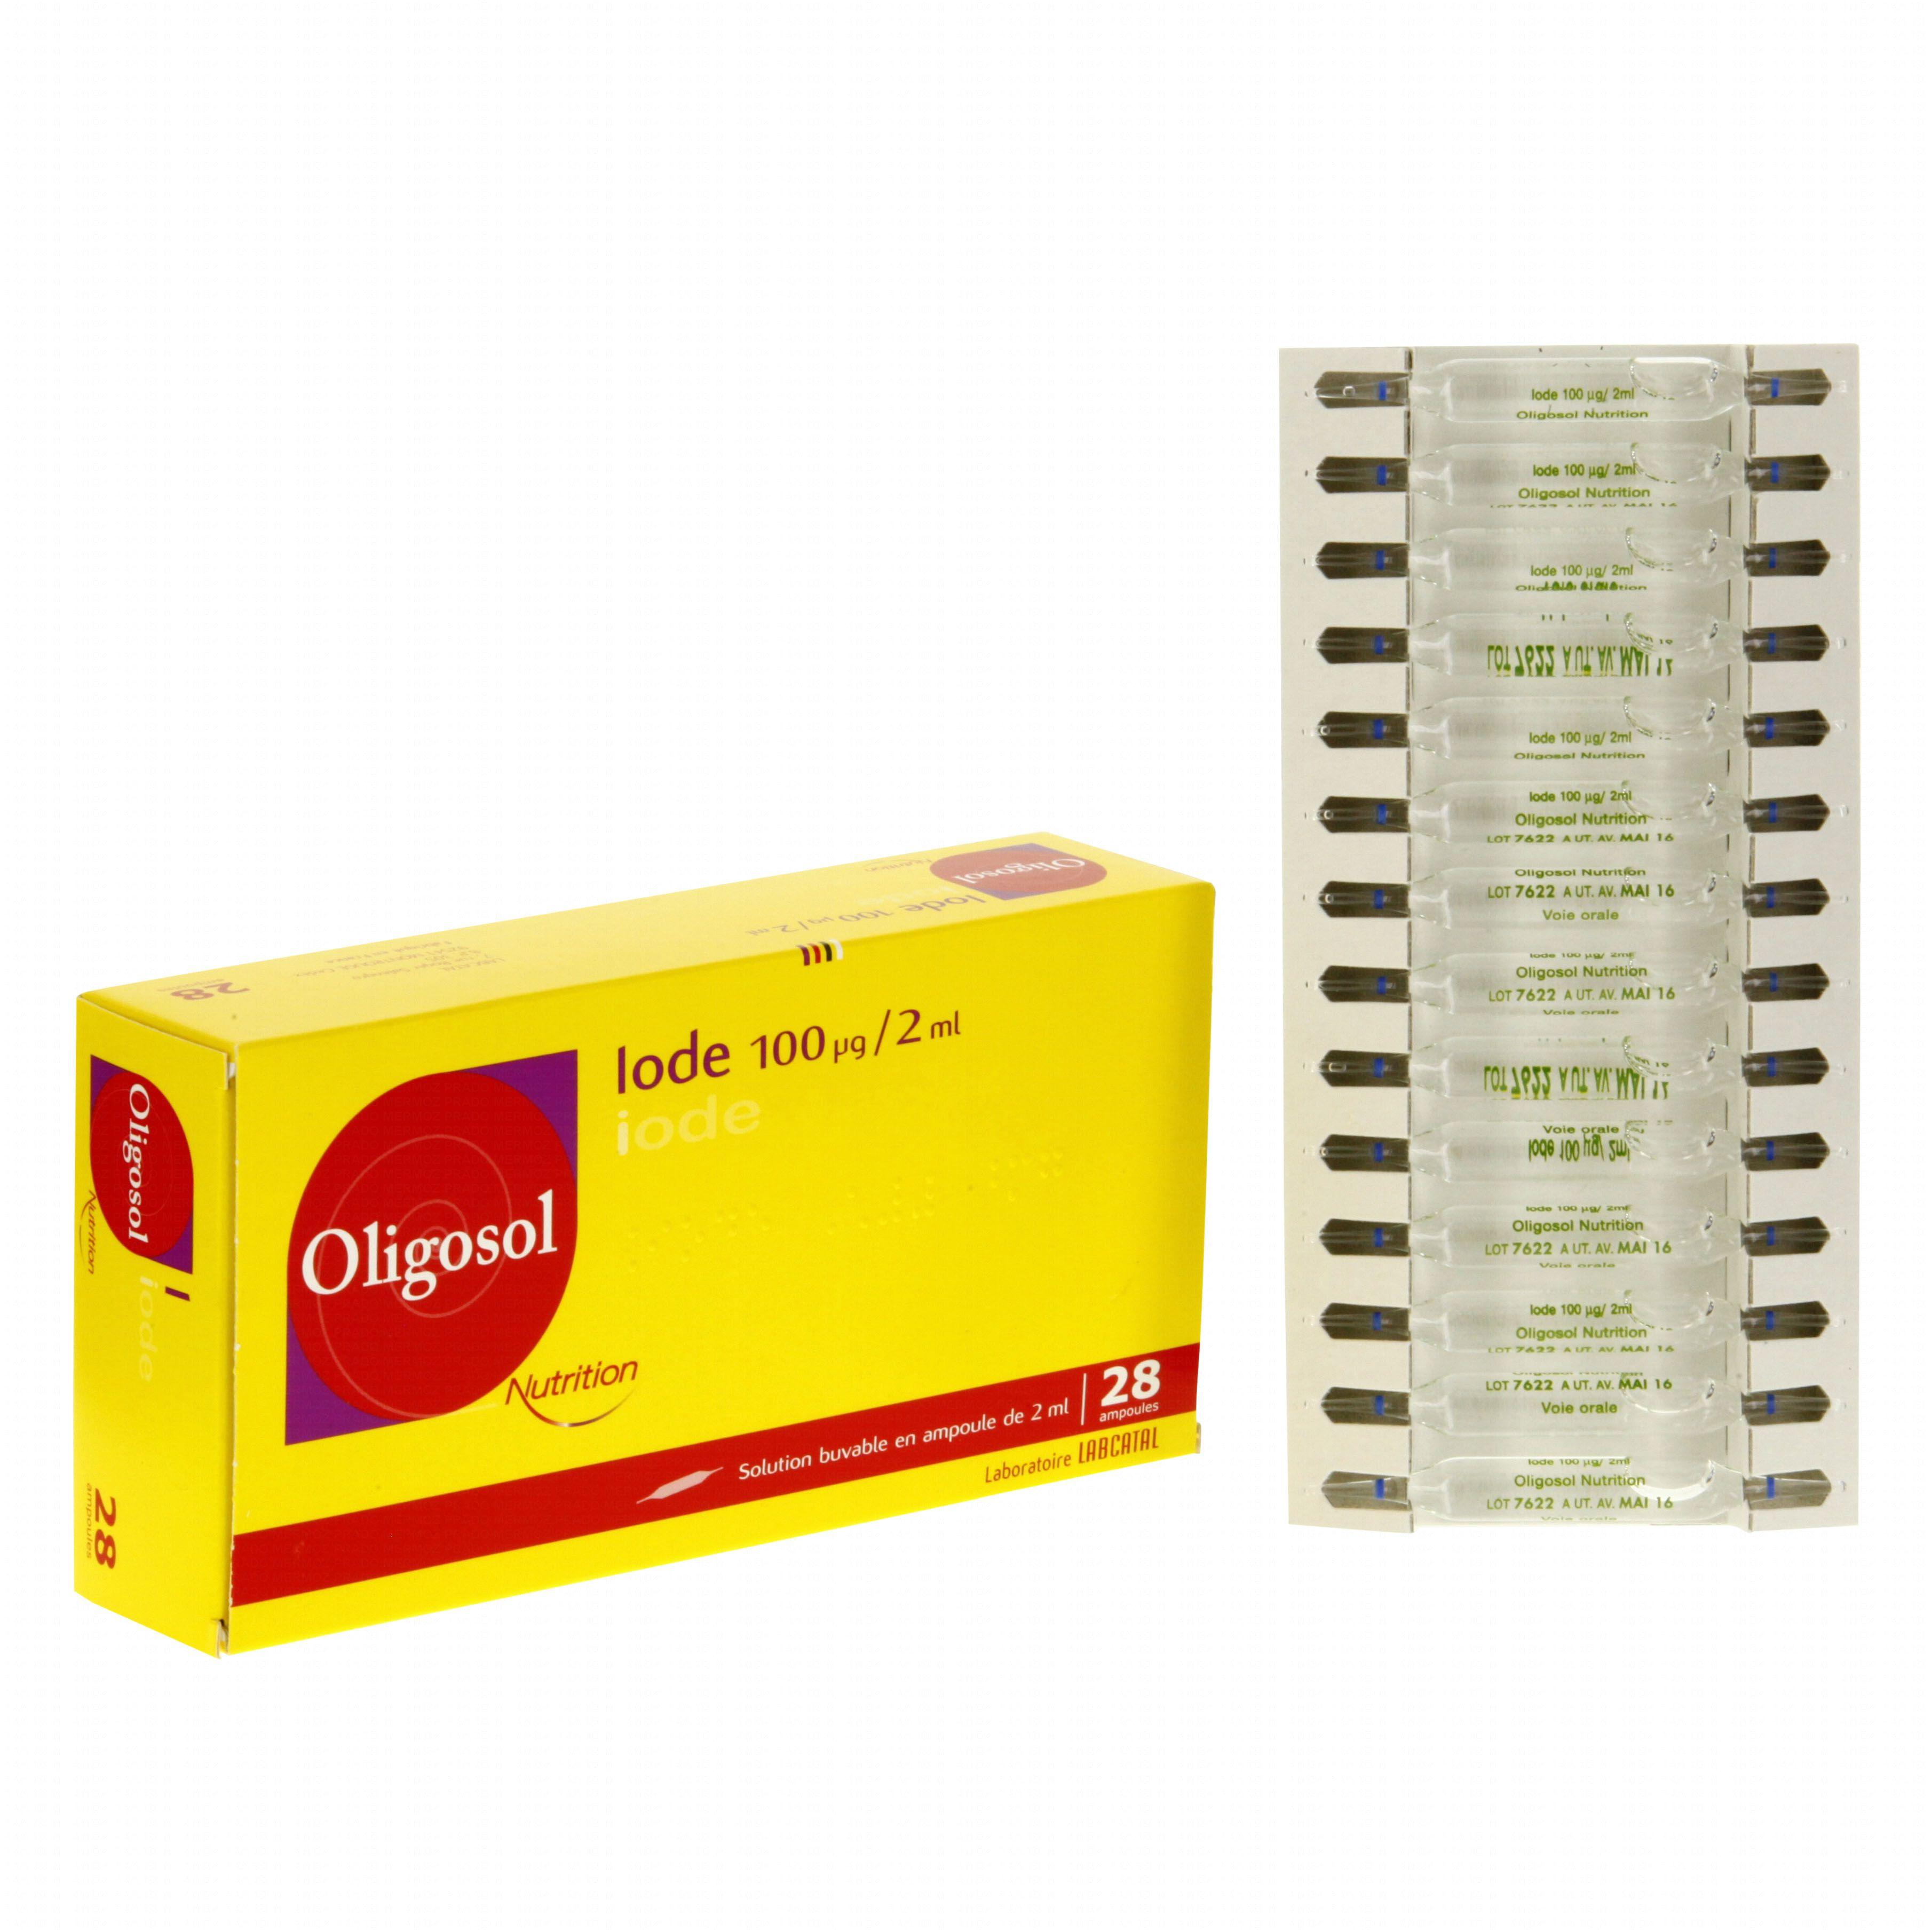 oligosol iode